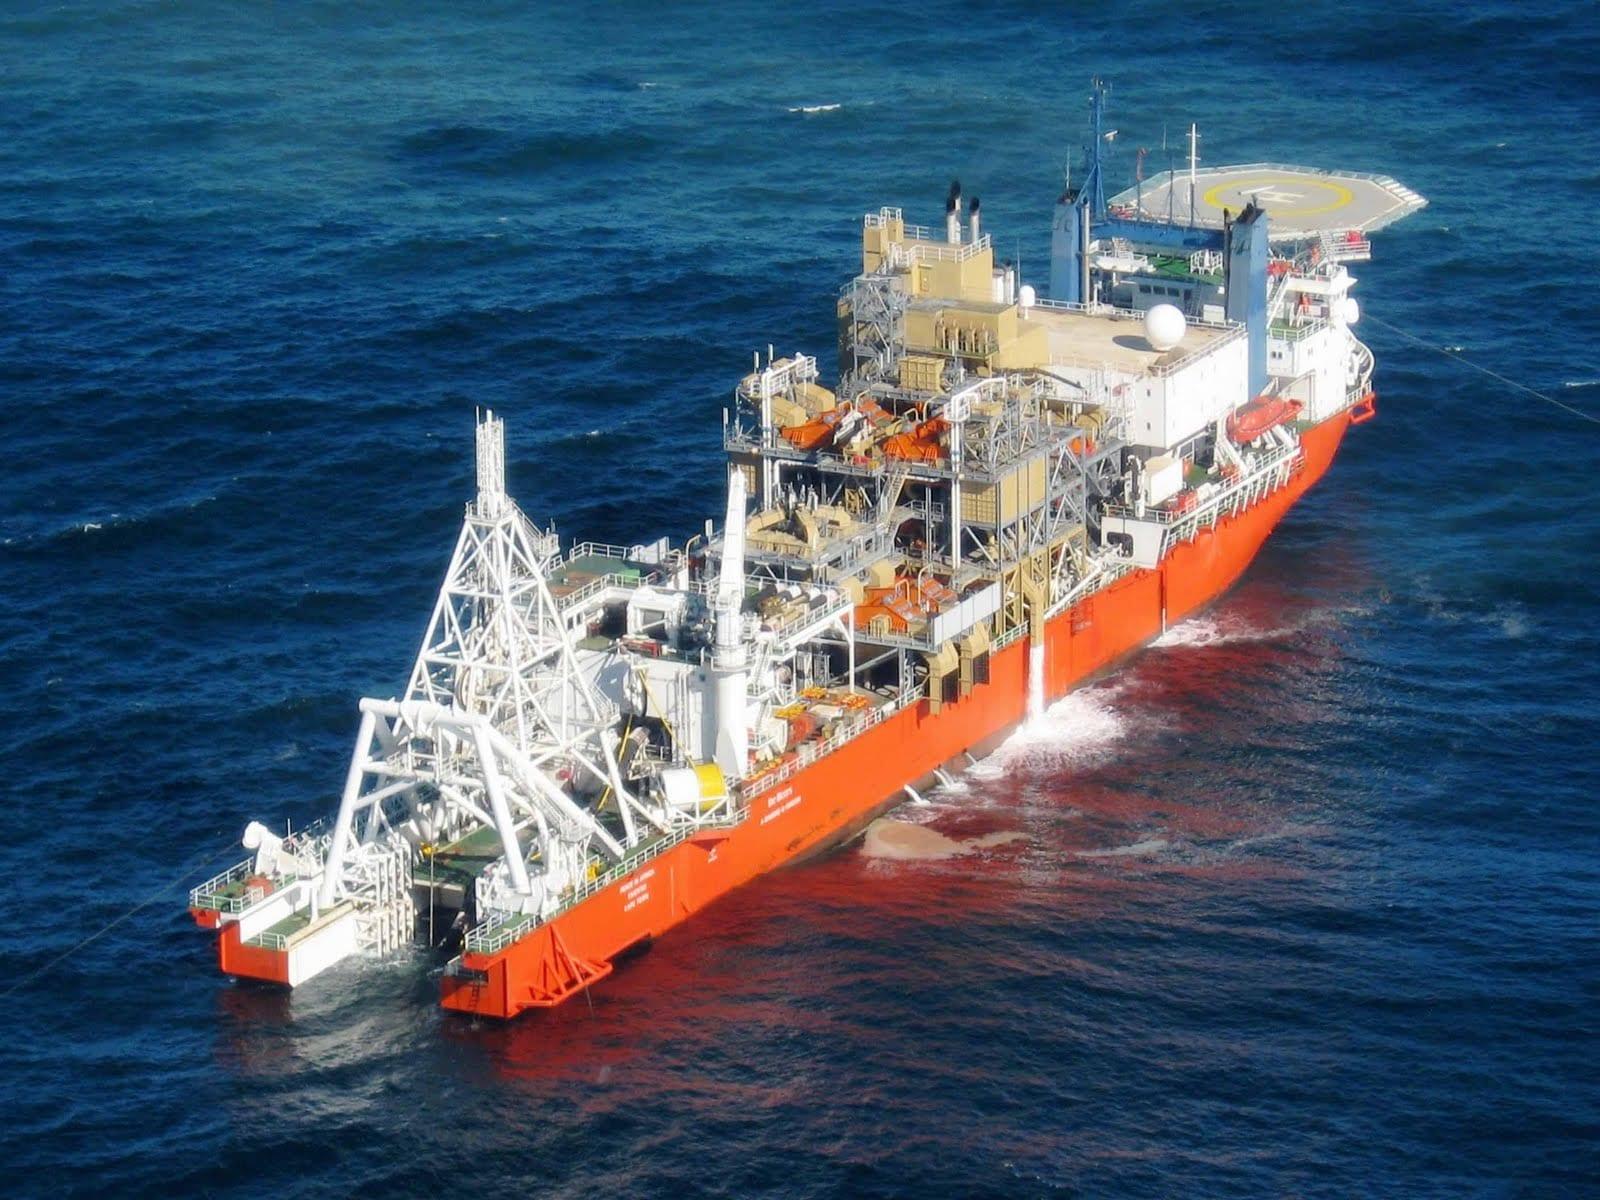 Undersea diamond mining – worried yet? You will be!